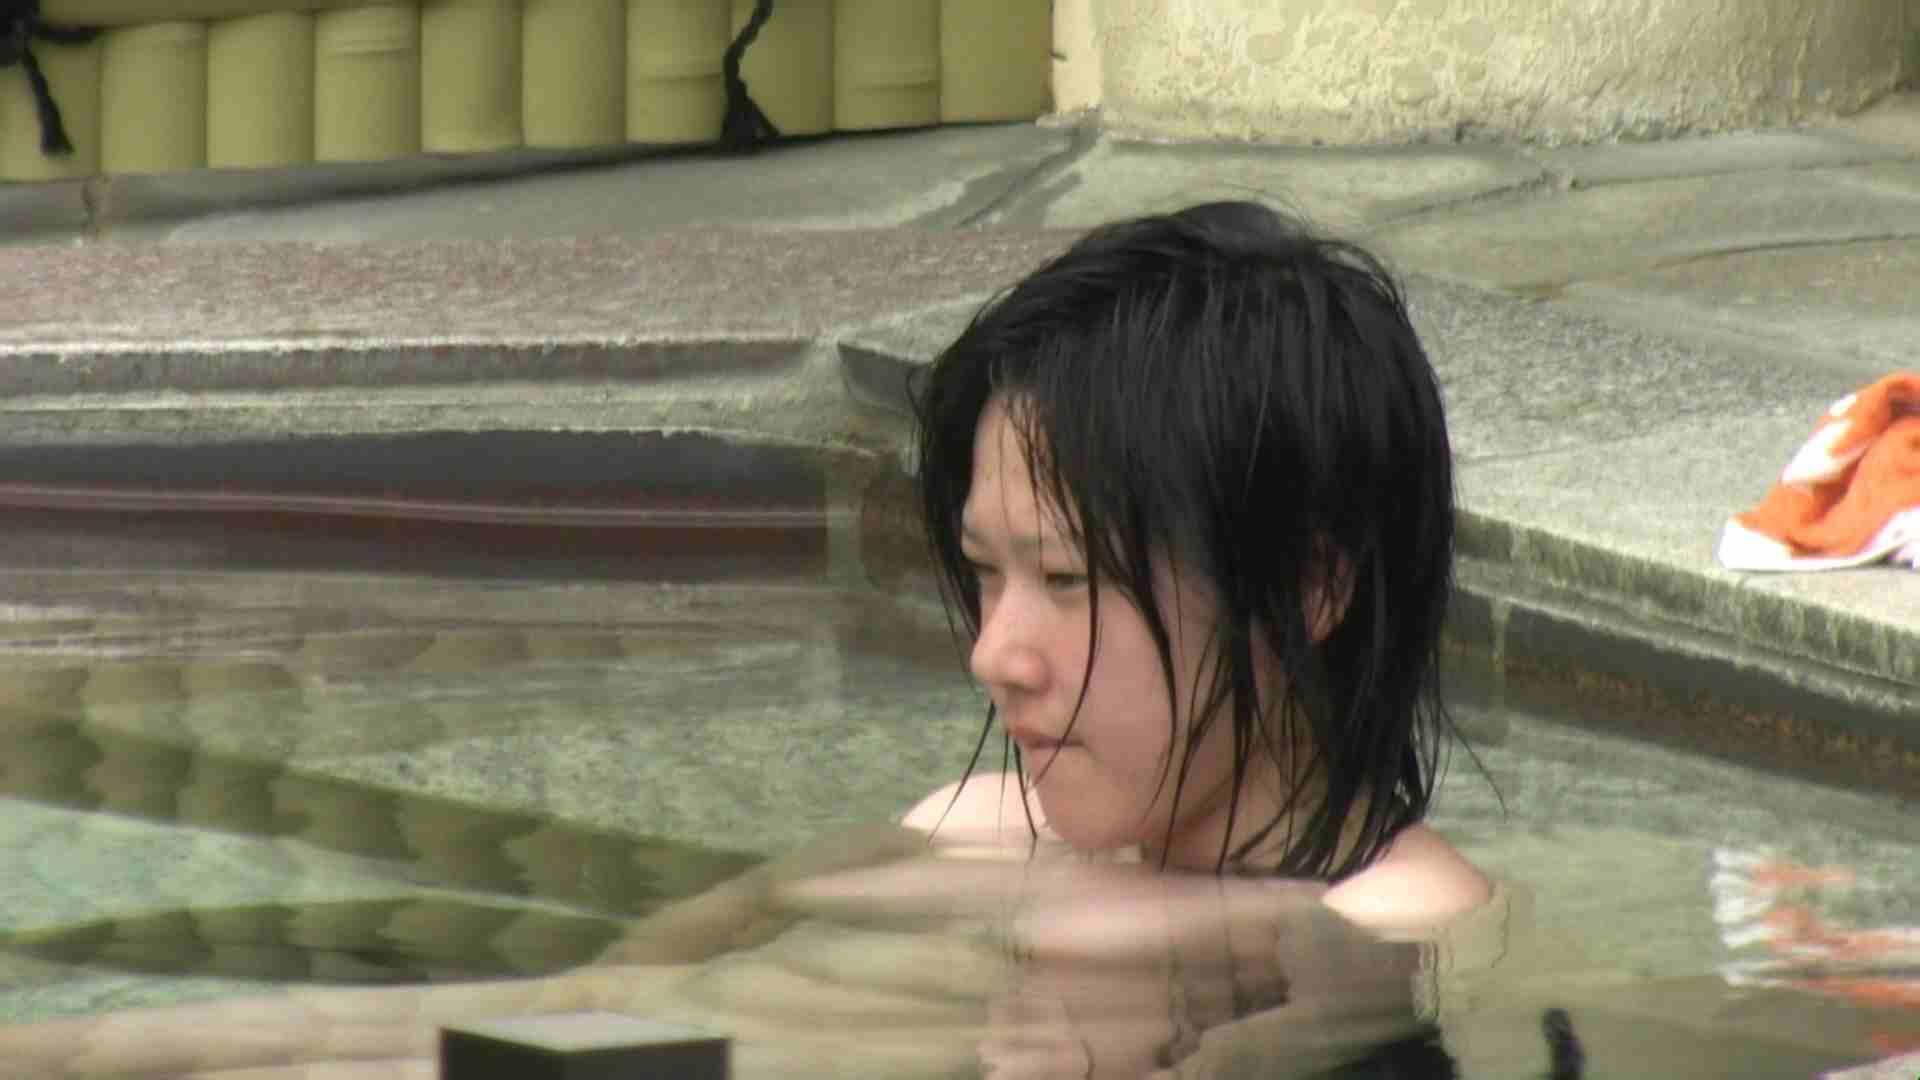 Aquaな露天風呂Vol.36 盗撮 | HなOL  68pic 38